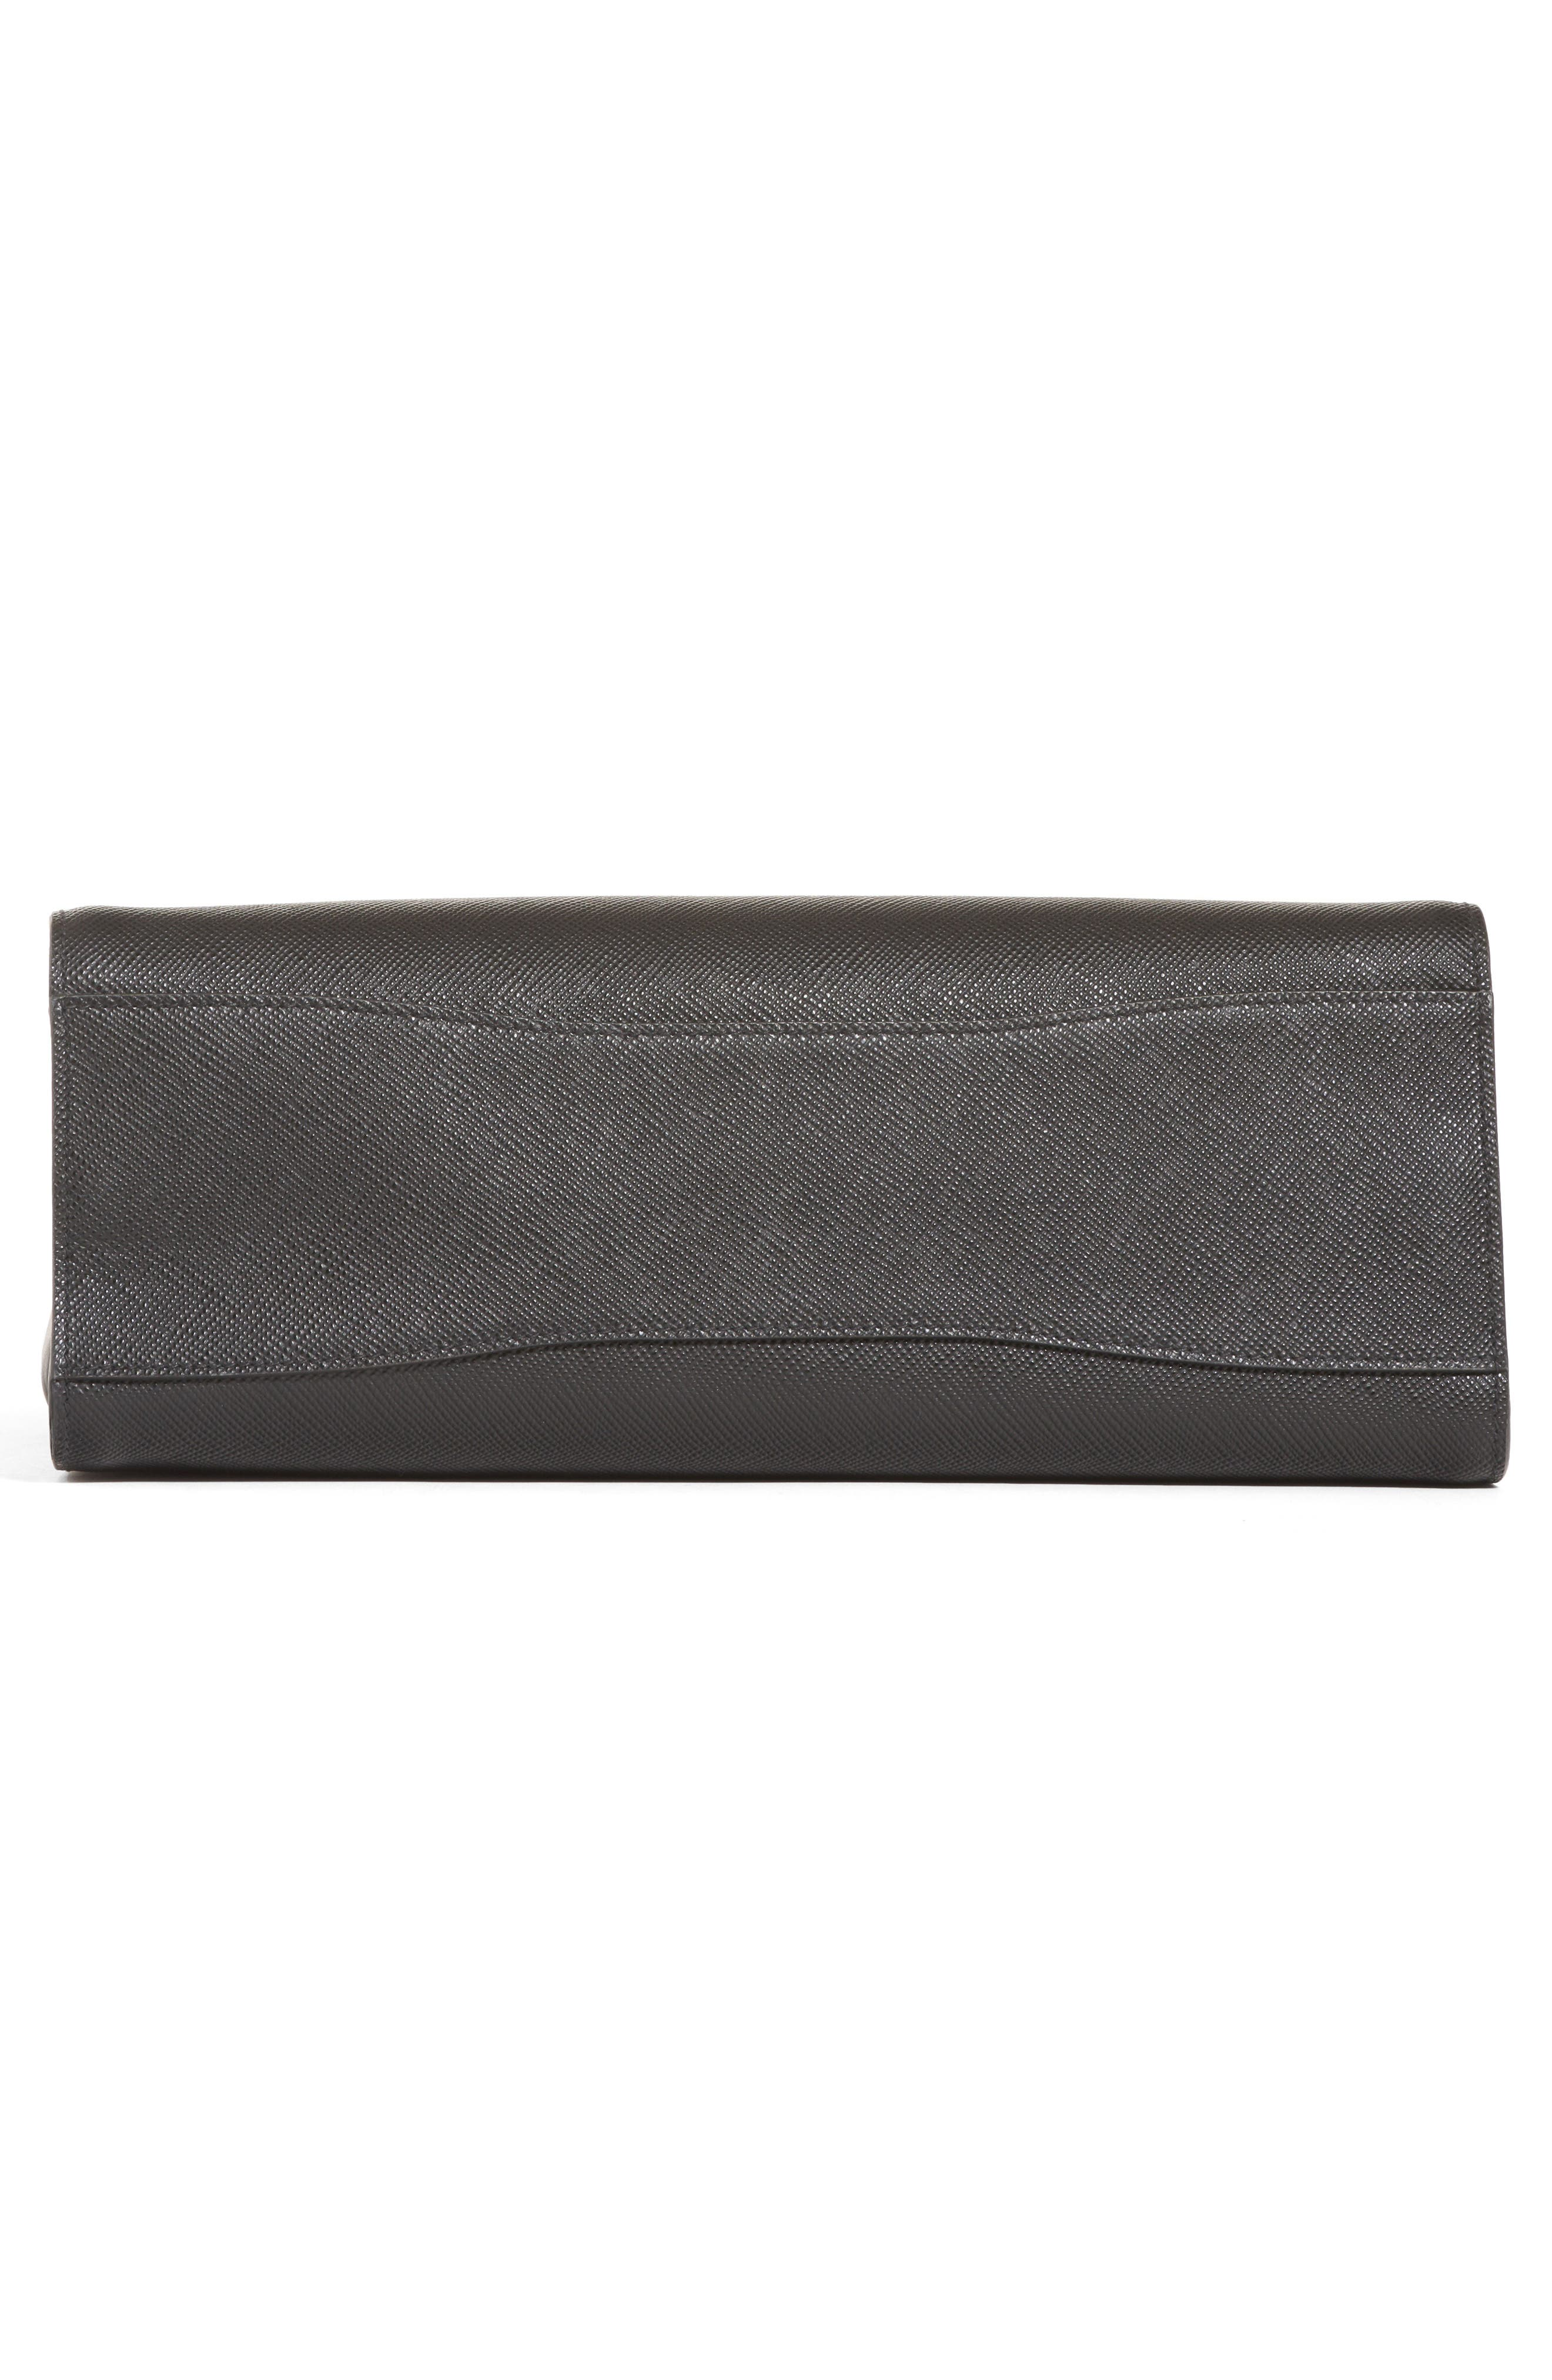 Medium Saffiano Leather Tote,                             Alternate thumbnail 5, color,                             001